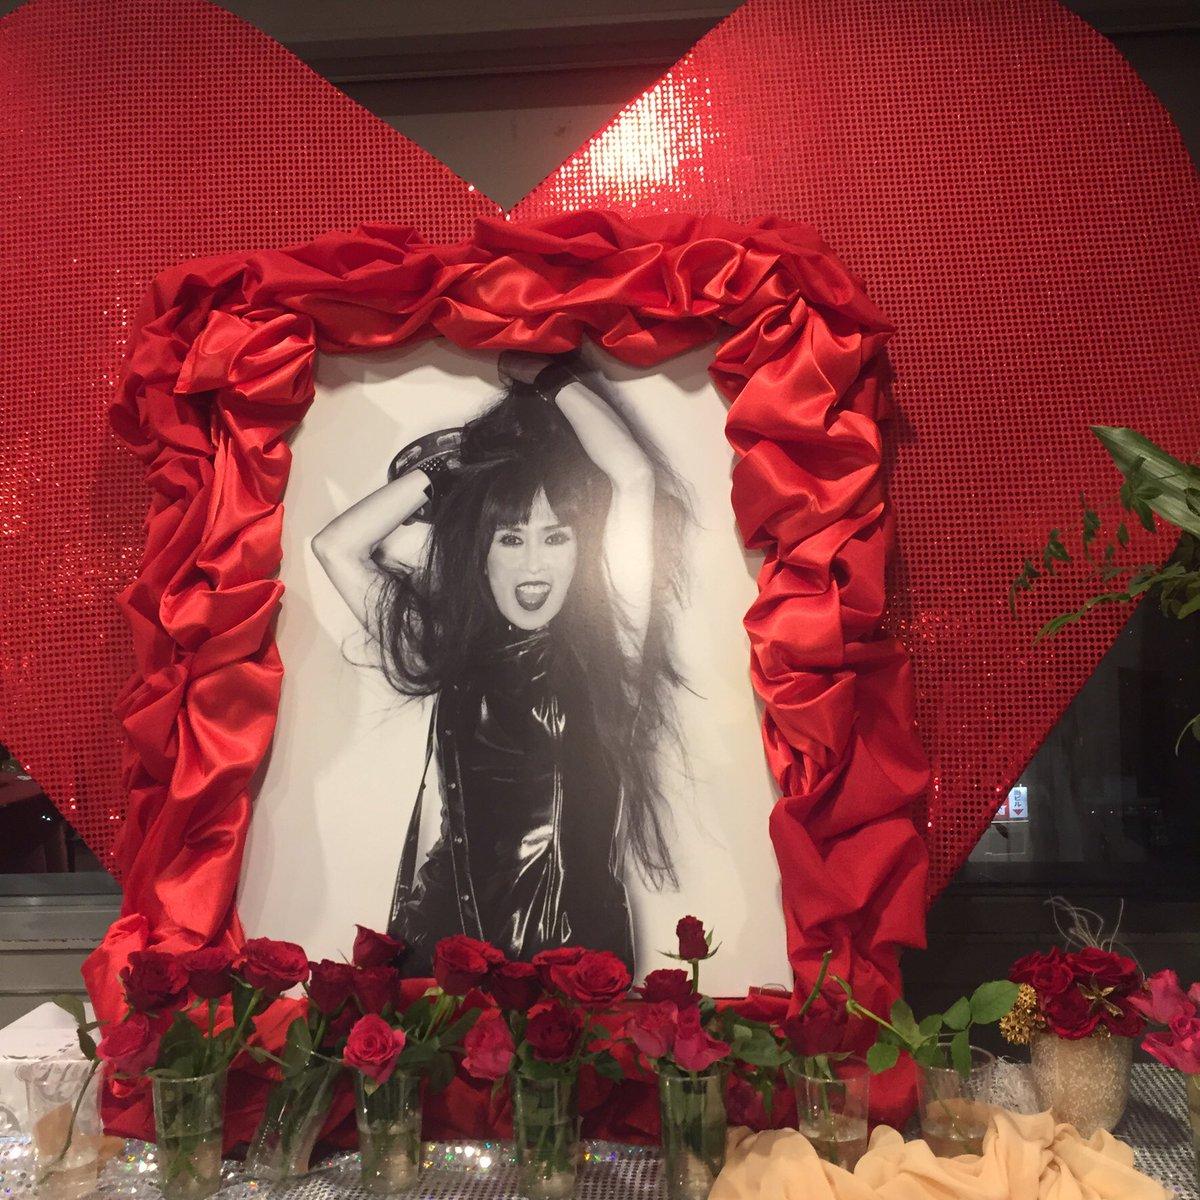 ValentinesDay シーナさんの一周忌@下北タウンホールへ。  SHEENA FOREVER  2枚目の写真は、昨年5月のSHEENA & THE ROKKETS @若松にて。 https://t.co/hiditxYxu8